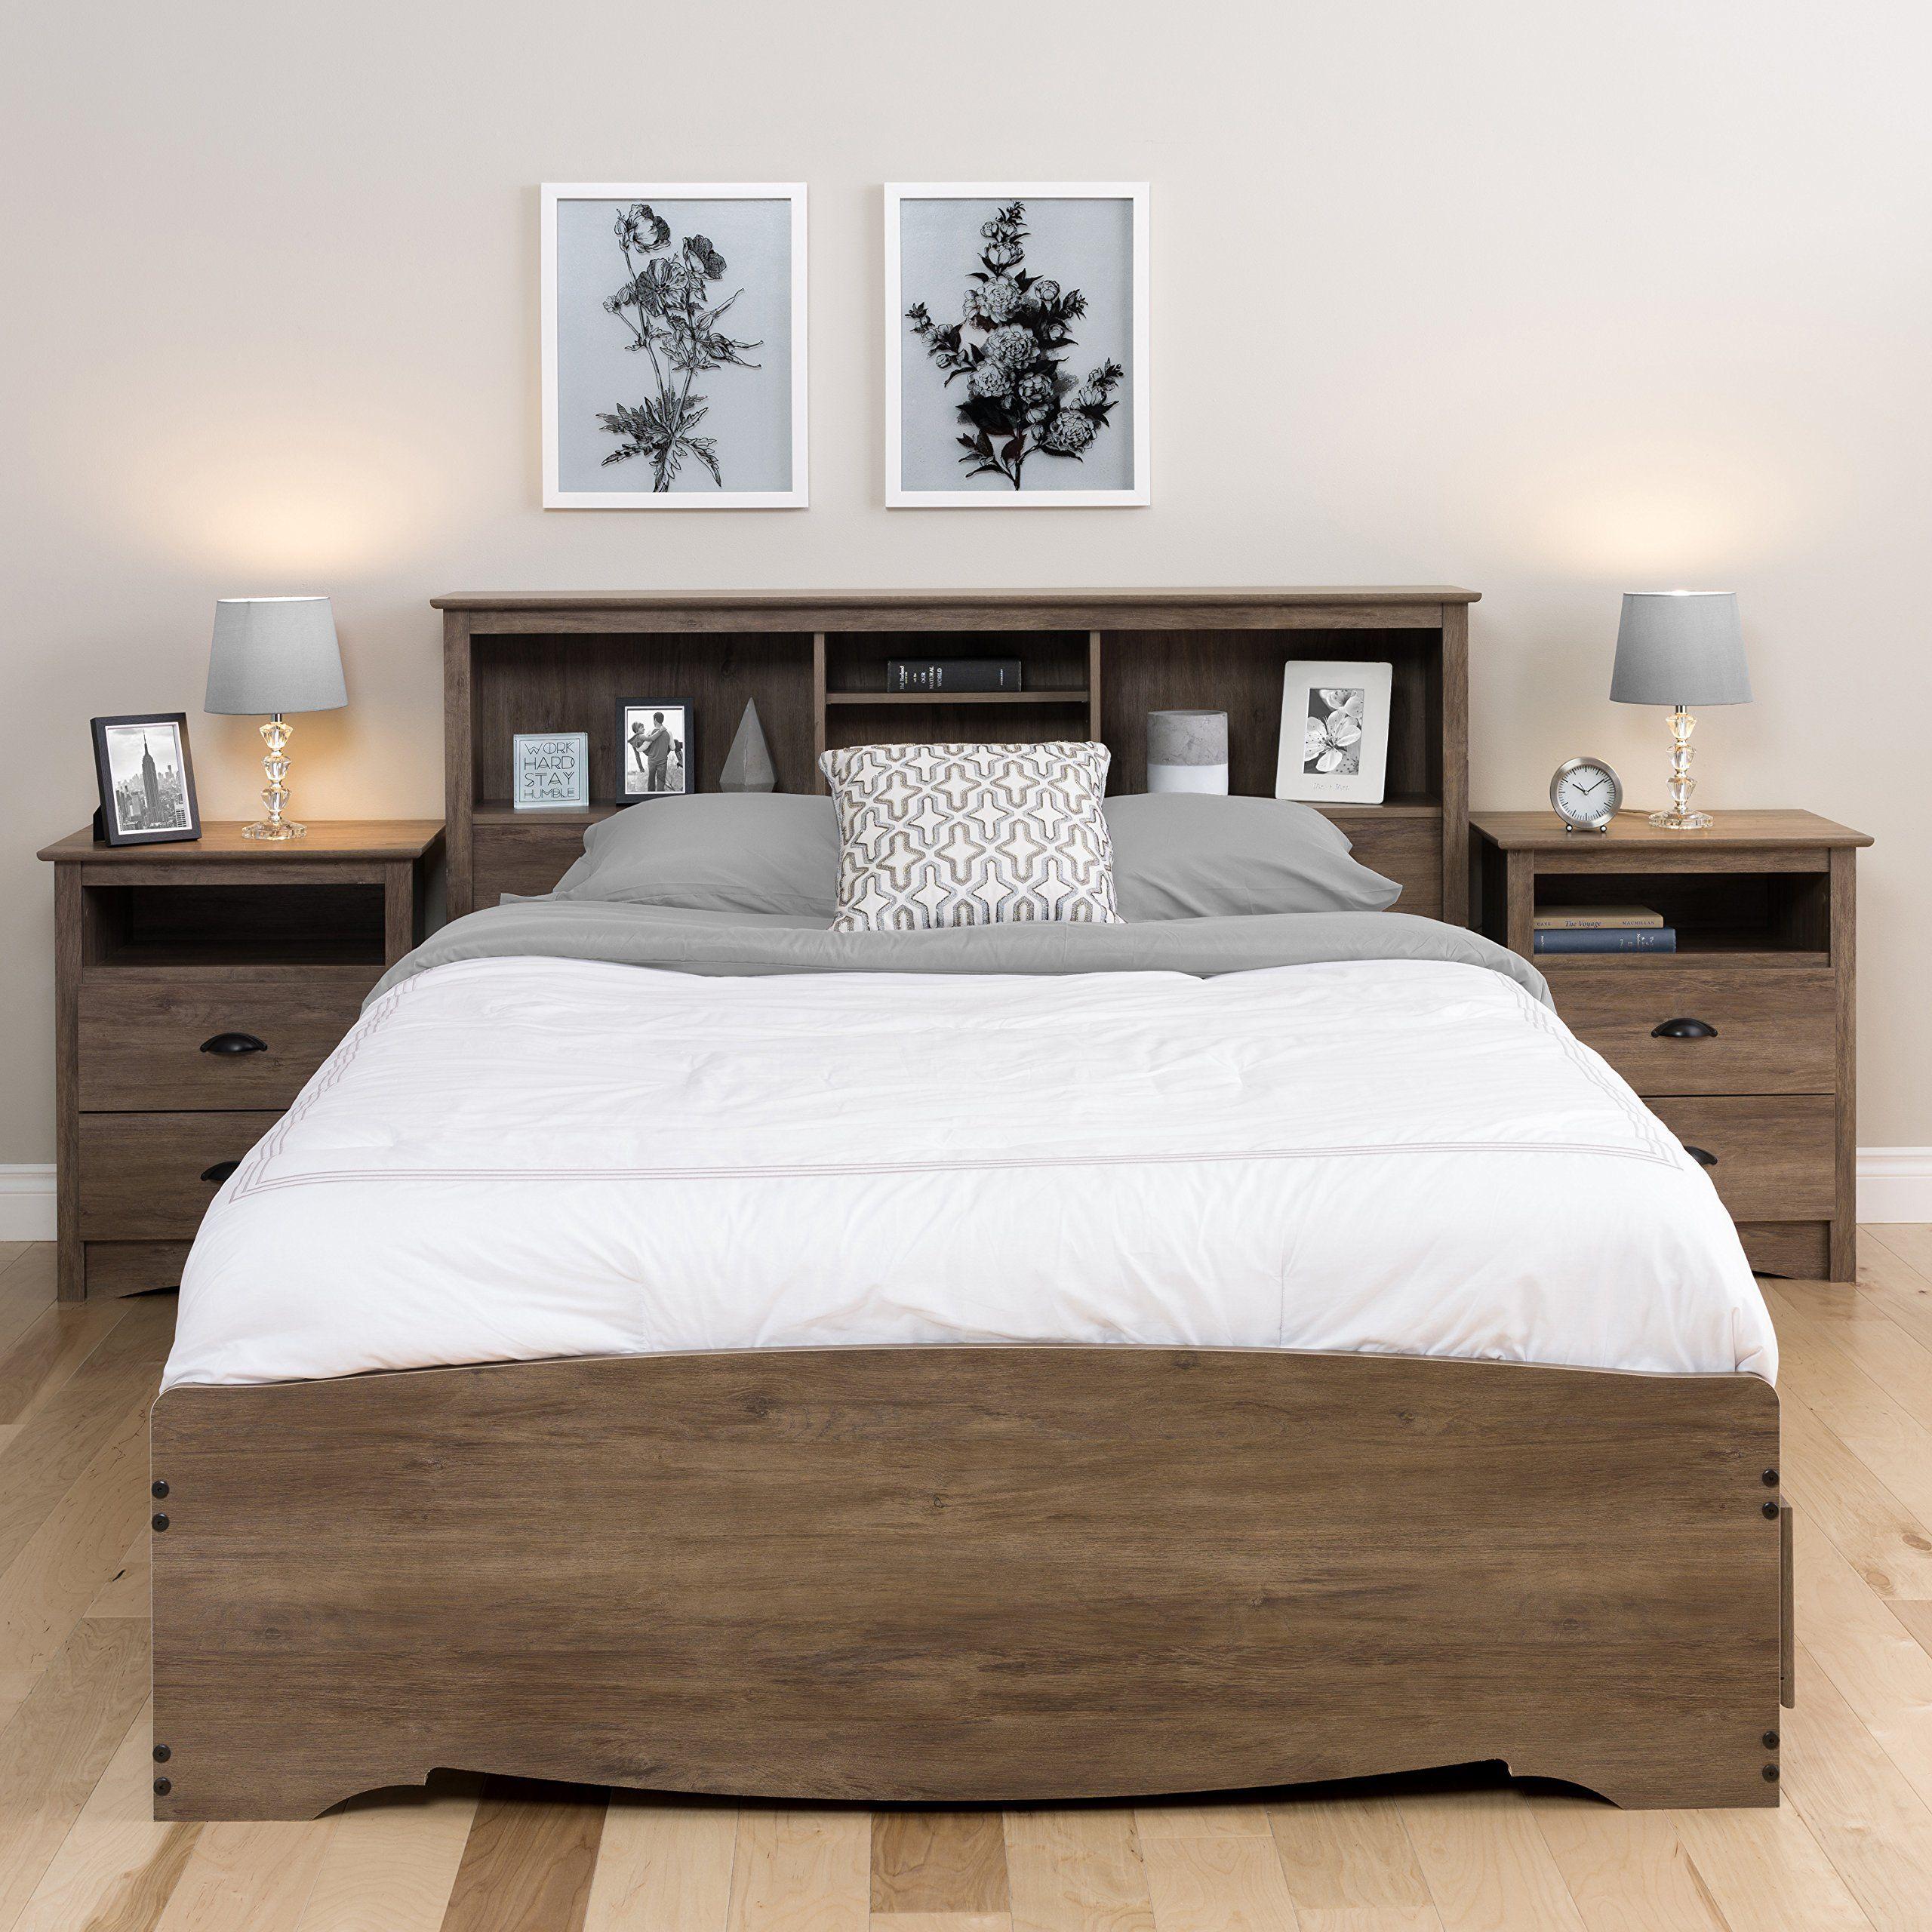 Prepac Ddc 2428 Salt Spring Tall Night Stand Drifted Gray Affiliate Night Beautiful Bedrooms Bedroom Size Prepac [ 2560 x 2560 Pixel ]